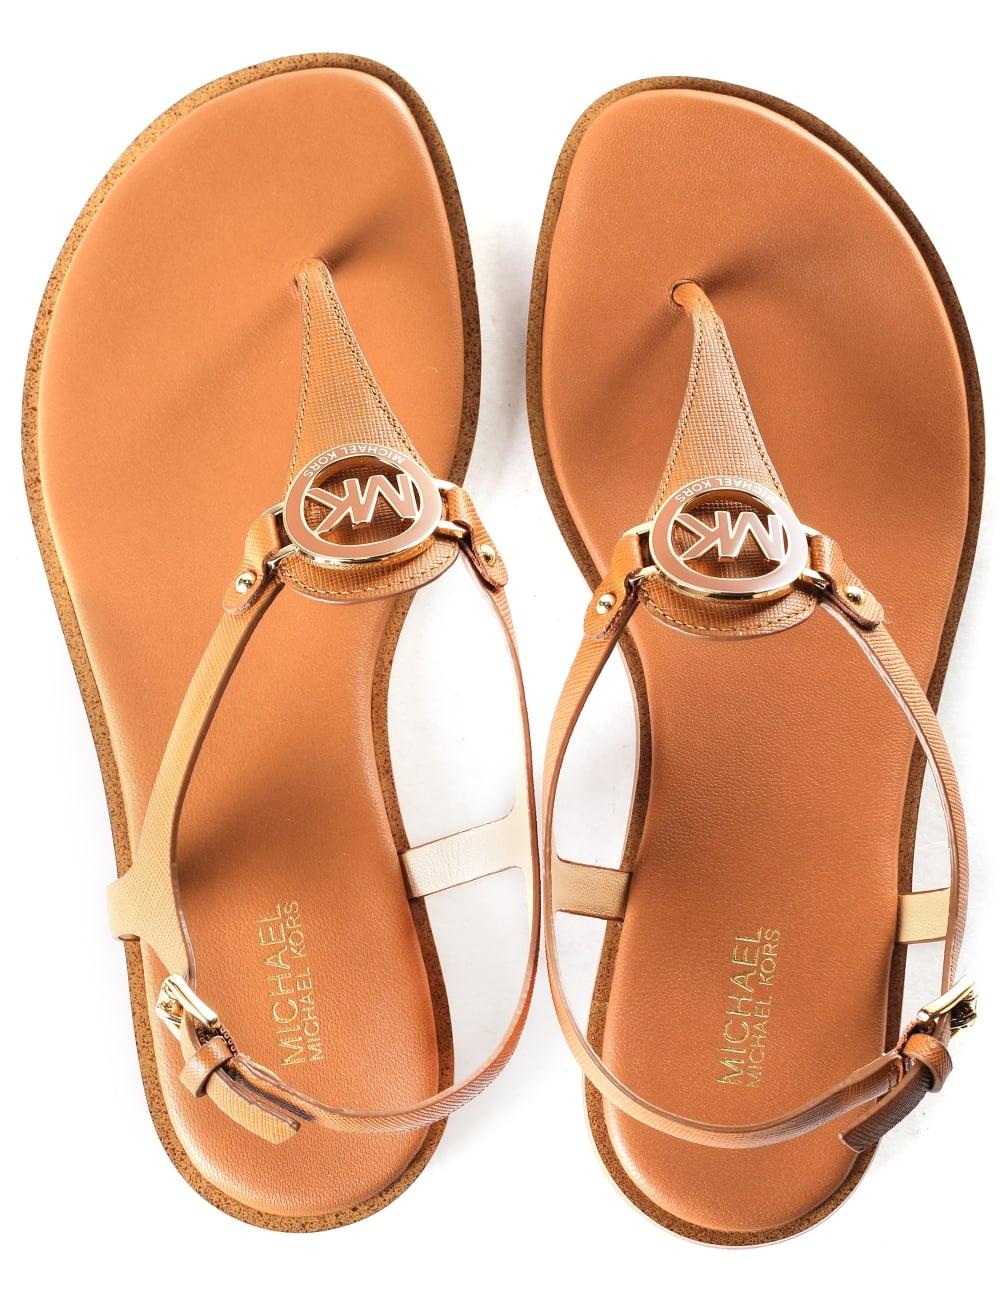 eedd9db663a0 Michael Kors Women s Lee Thong Sandals